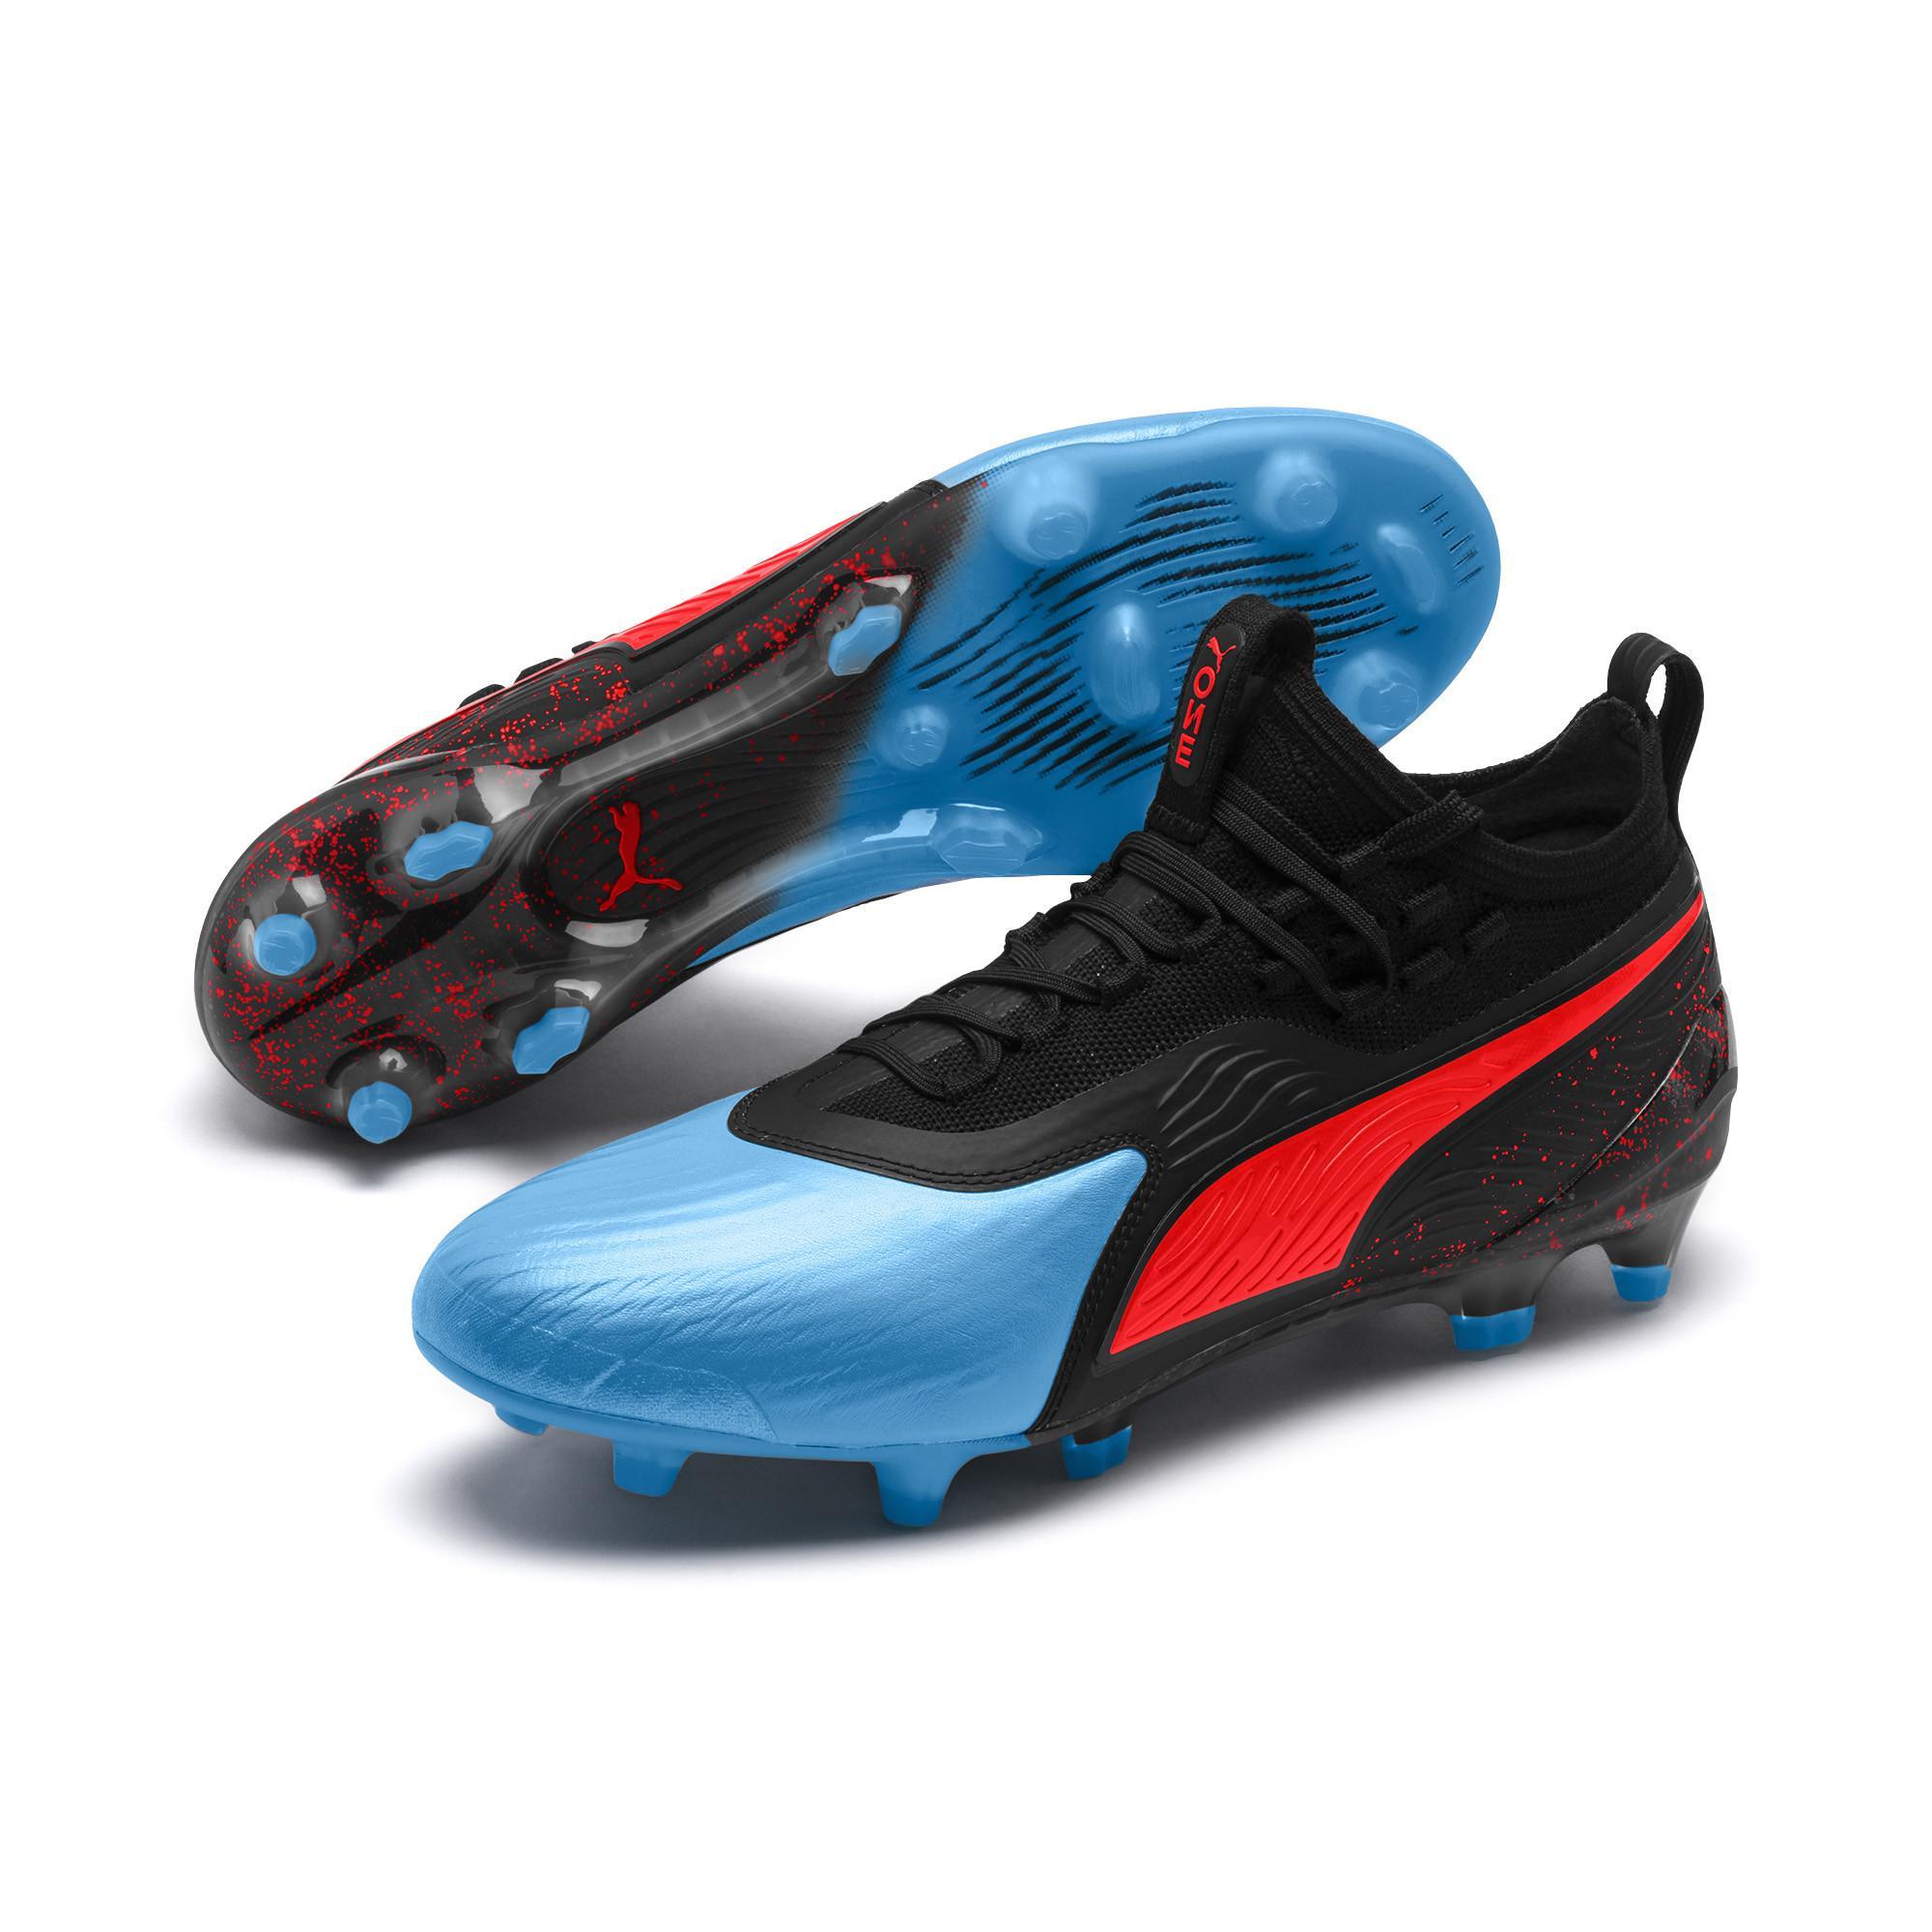 PUMA - Multicolor One 19.1 Fg ag Men s Soccer Cleats for Men - Lyst. View  fullscreen 6a611def7